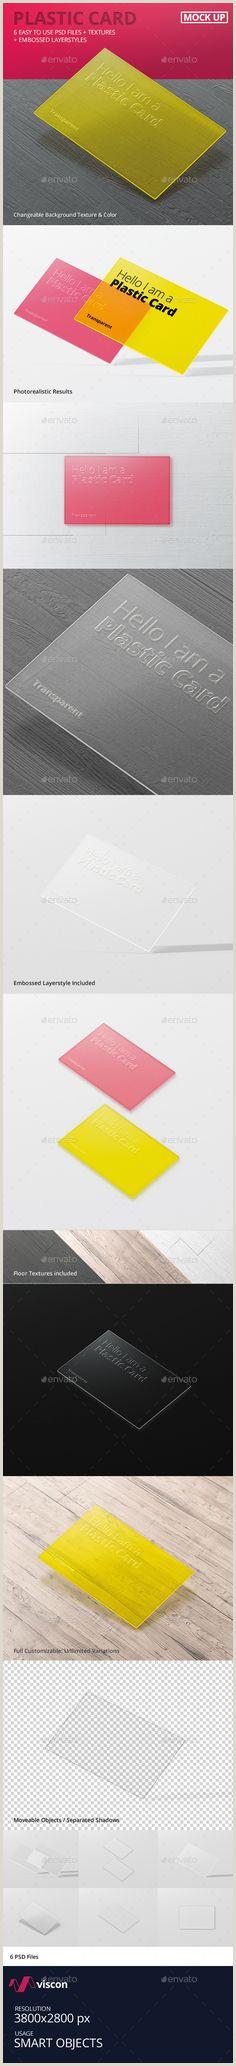 Unique Business Cards Clear 30 透明名片 Ideas